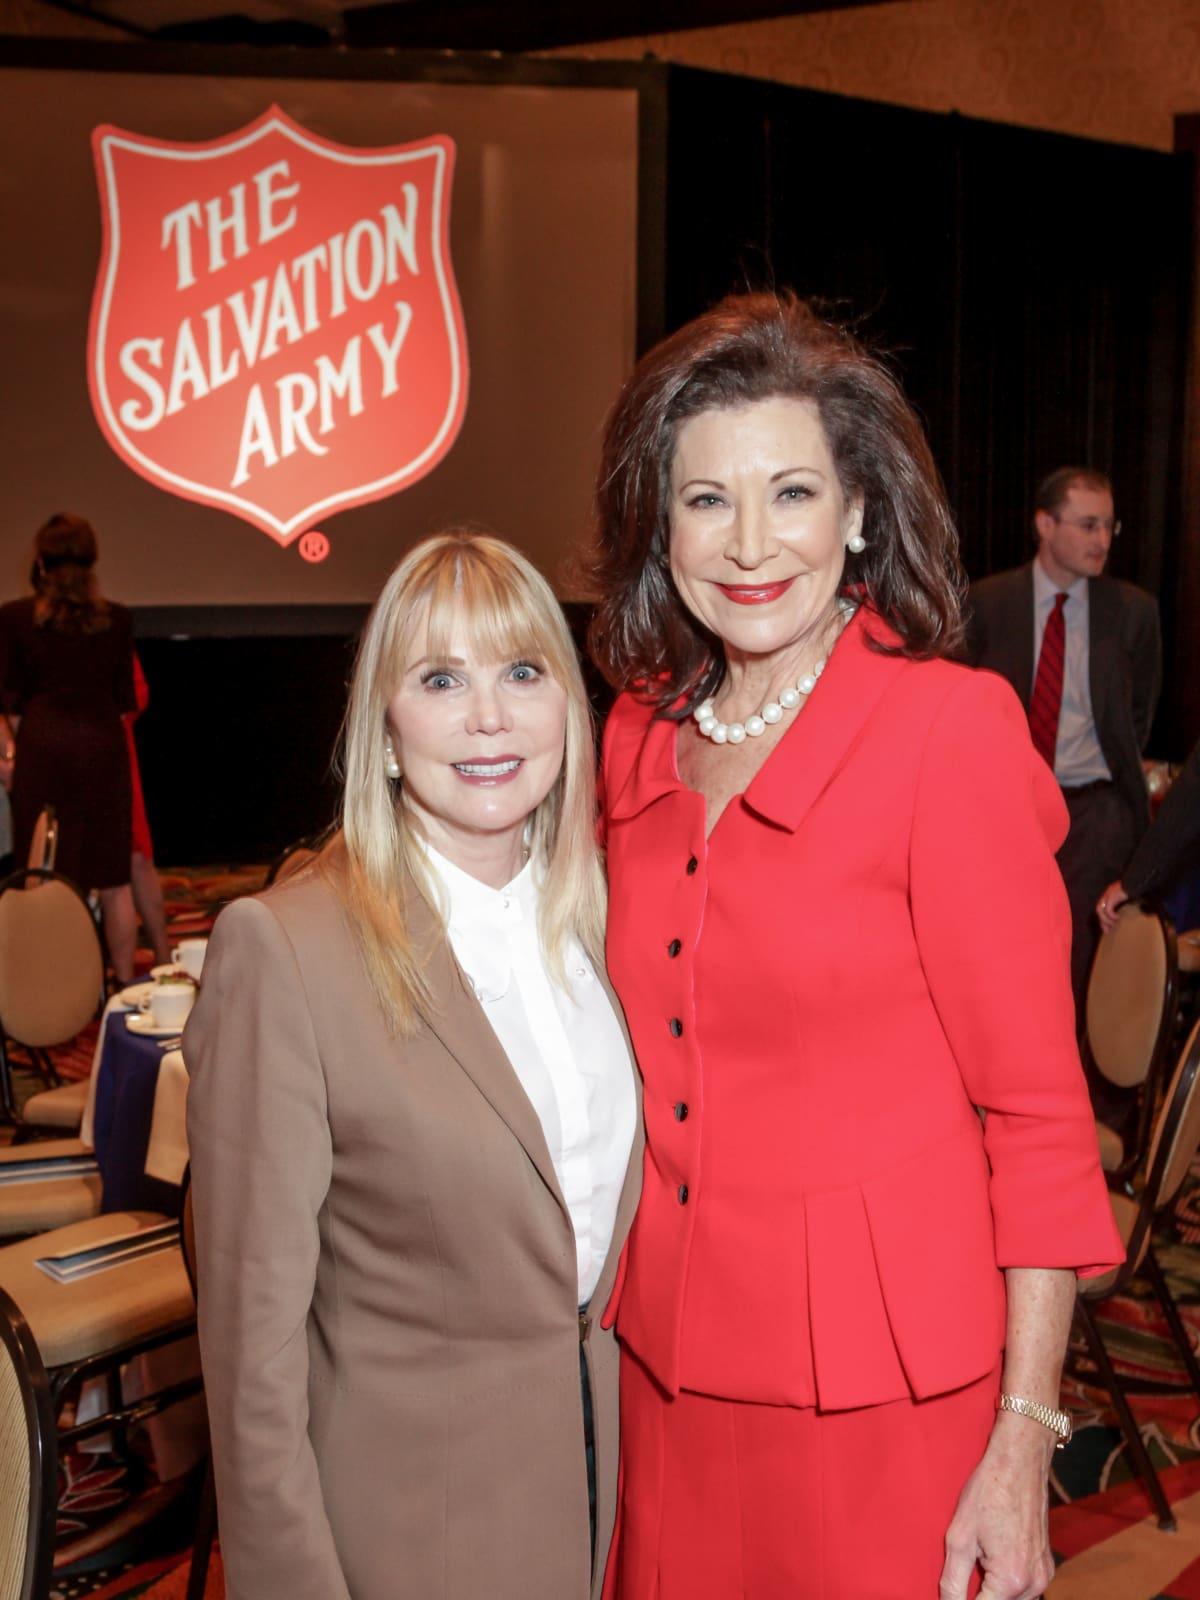 News, Shelby, Salvation Army luncheon, Nov. 2015, Brenda Love, Betty Hrncir